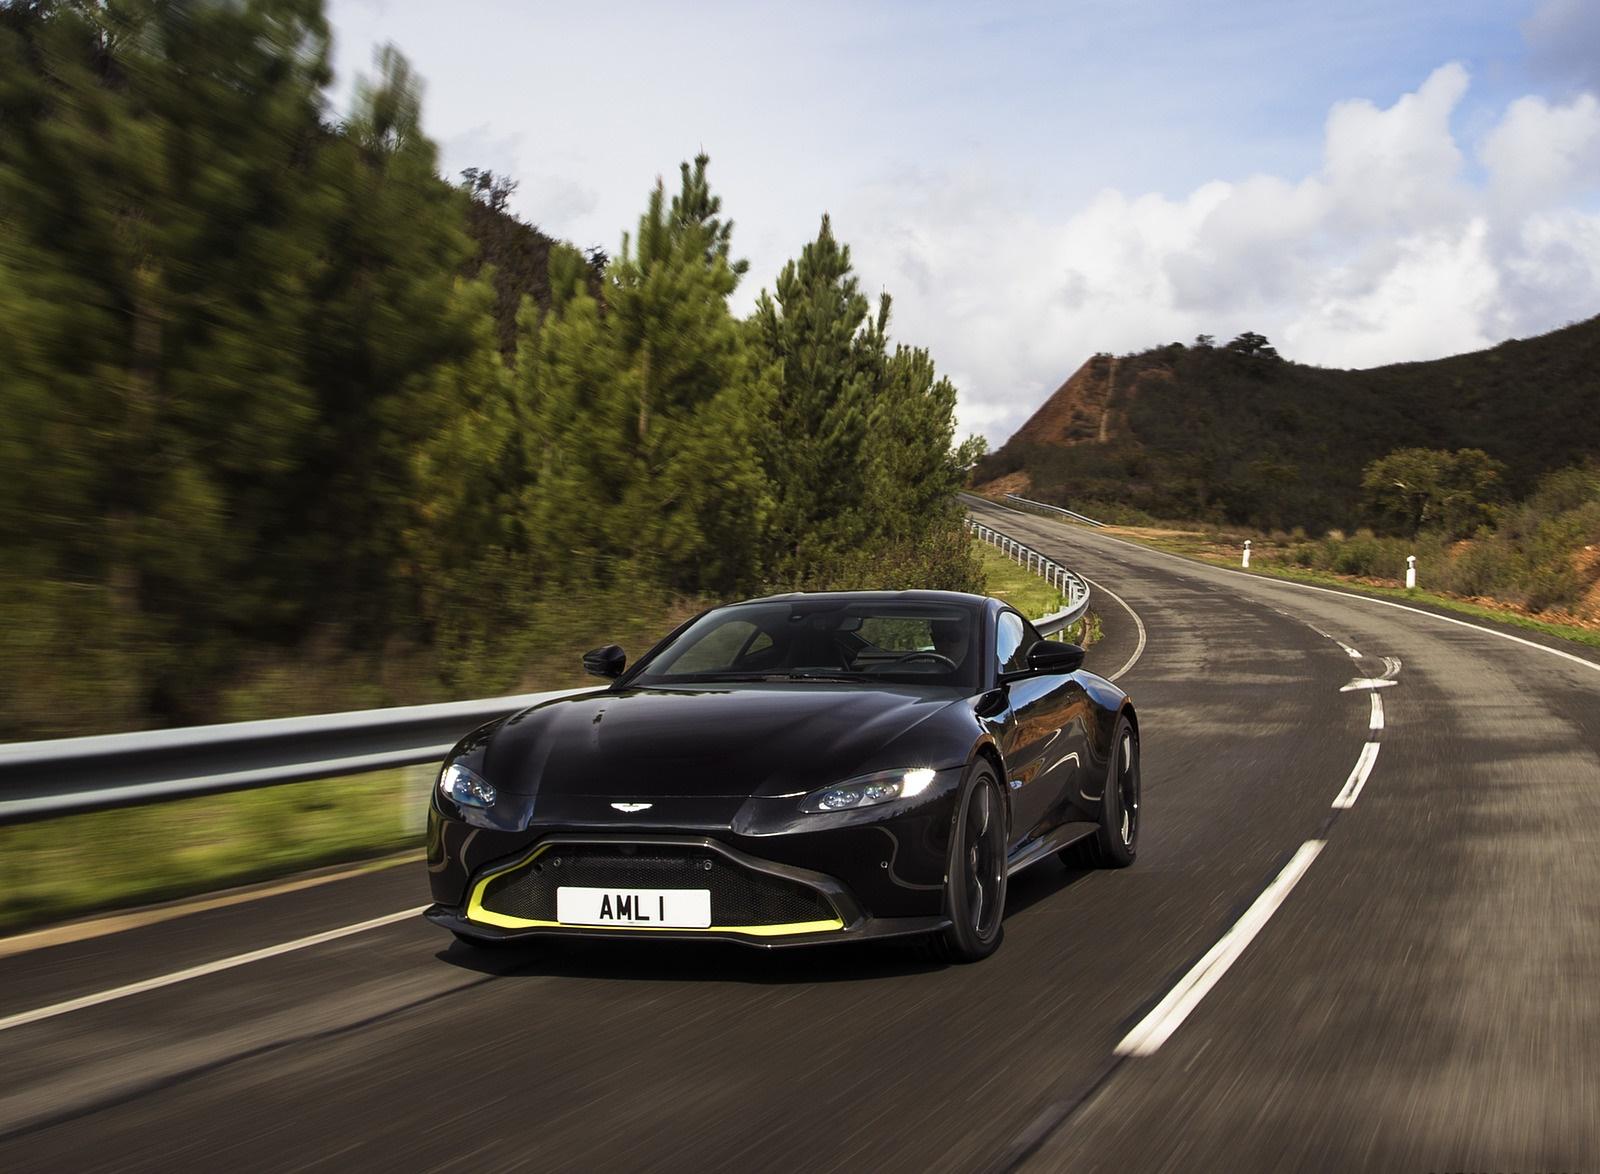 2019 Aston Martin Vantage (Onyx Black) Front Wallpaper (11)